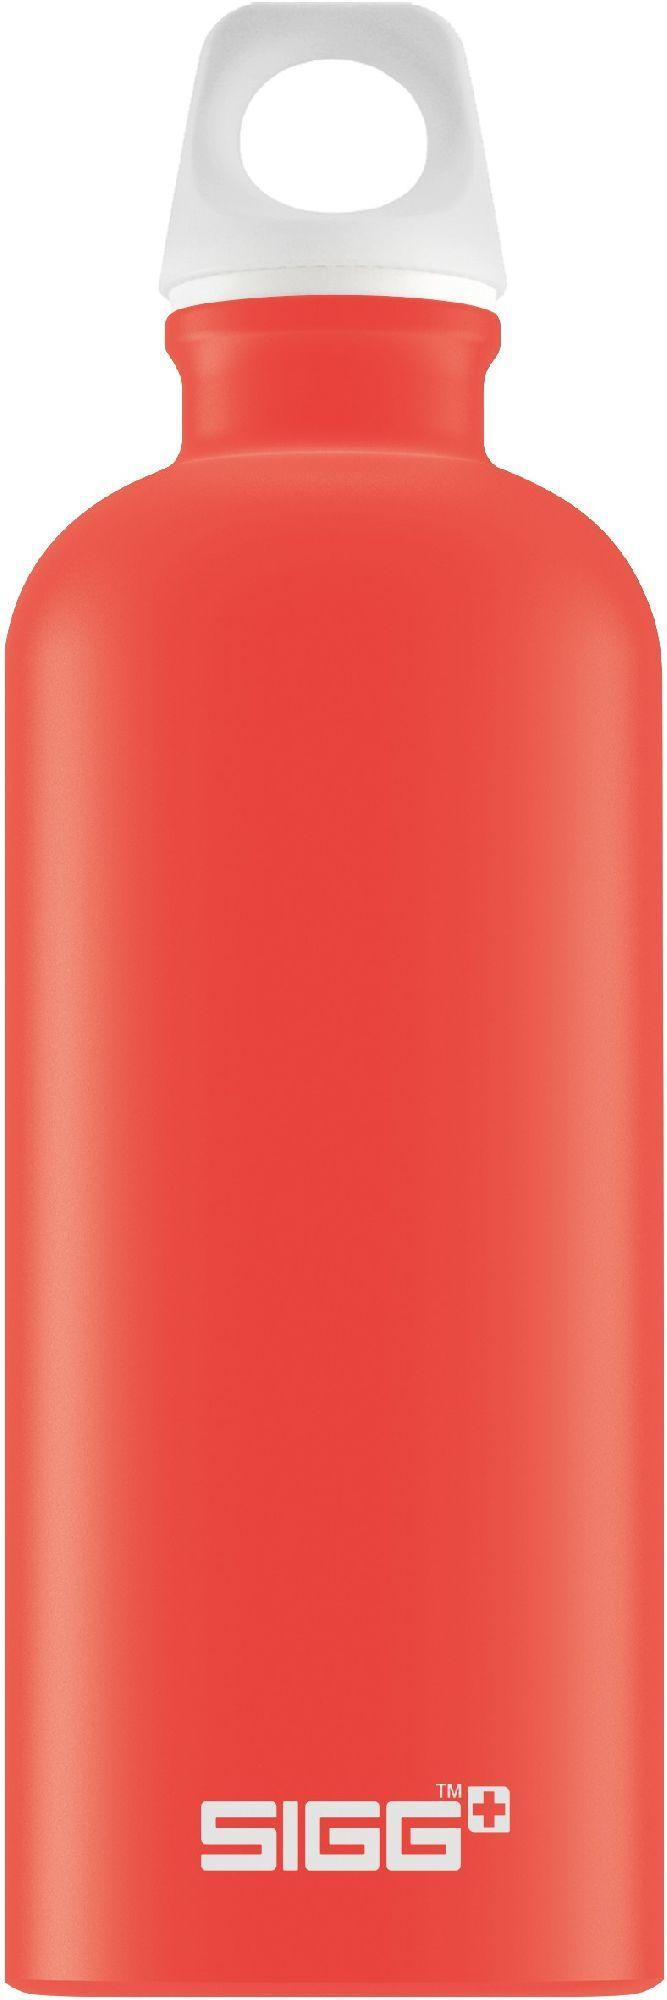 SIGG Butelka na wodę czerwona 600ml 1